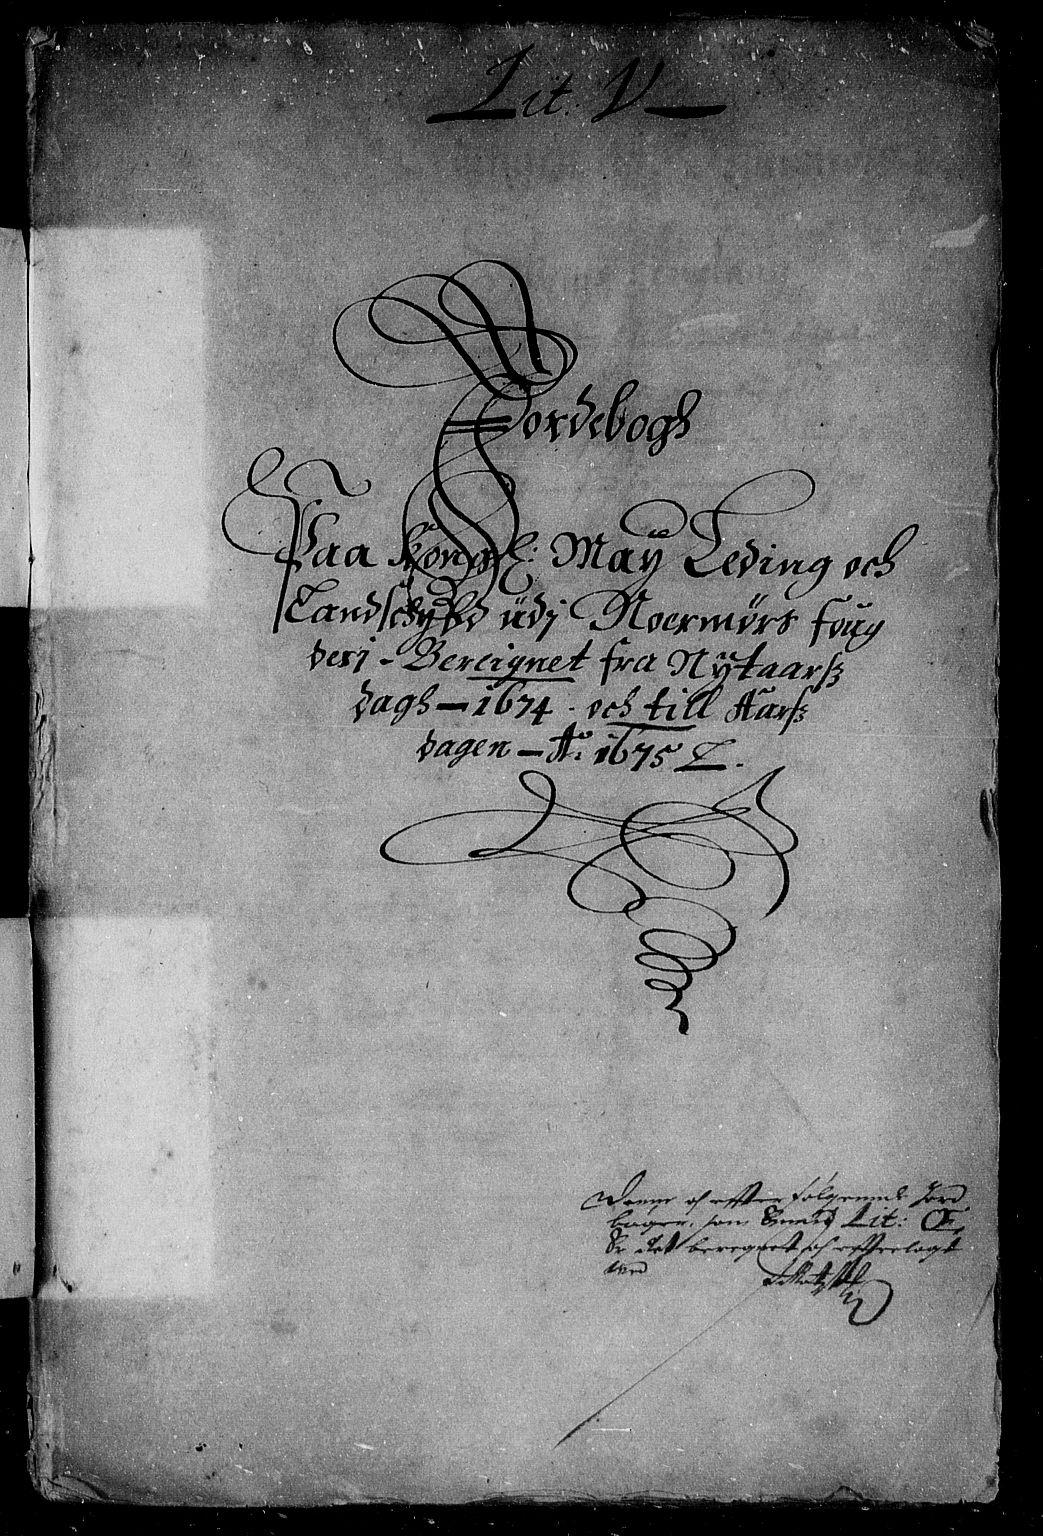 RA, Rentekammeret inntil 1814, Reviderte regnskaper, Stiftamtstueregnskaper, Trondheim stiftamt og Nordland amt, R/Rd/L0042: Trondheim stiftamt, 1670-1675